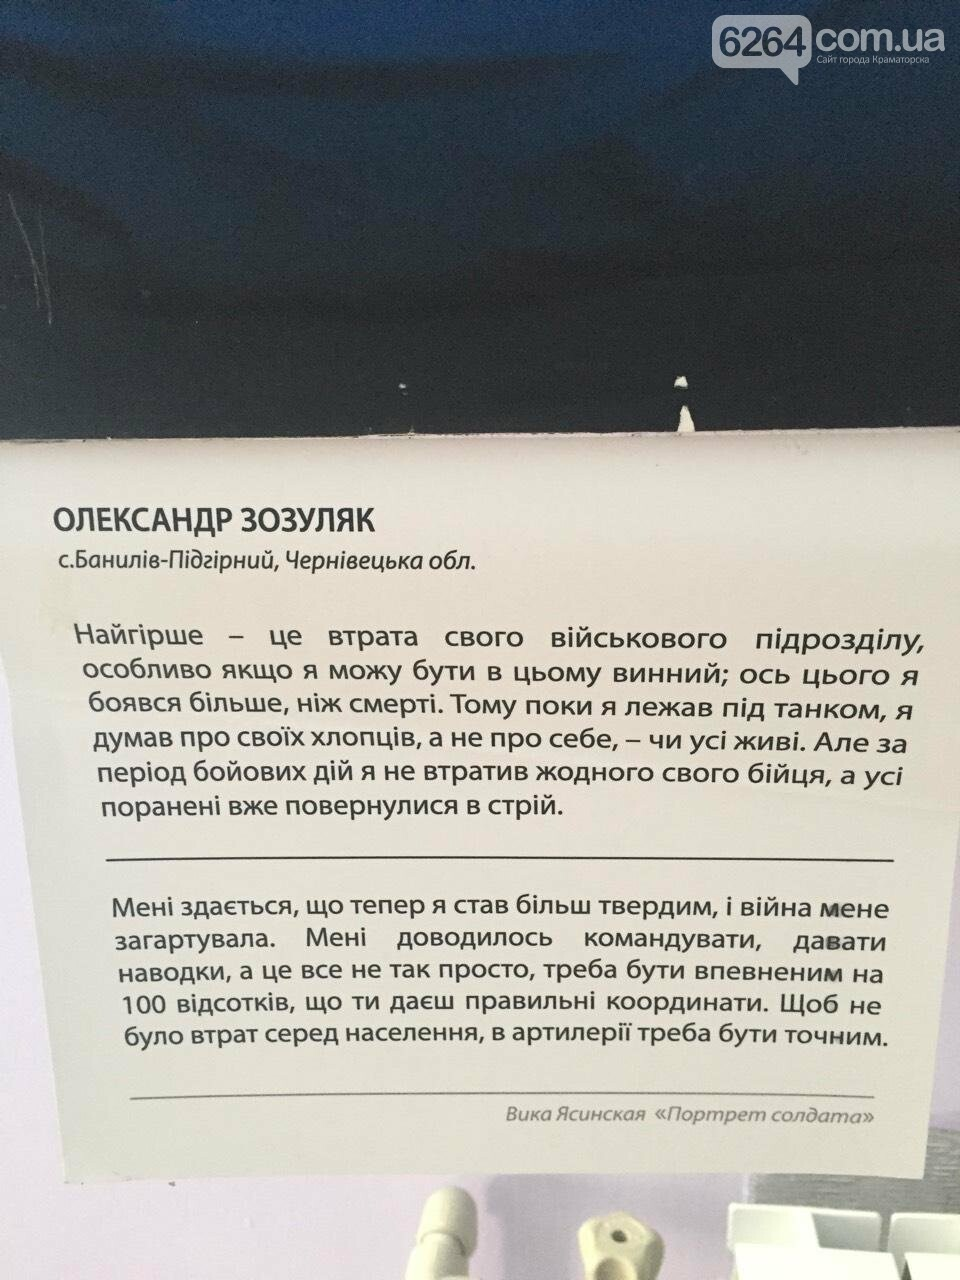 В Краматорске проходит выставка «Портрет солдата», фото-5